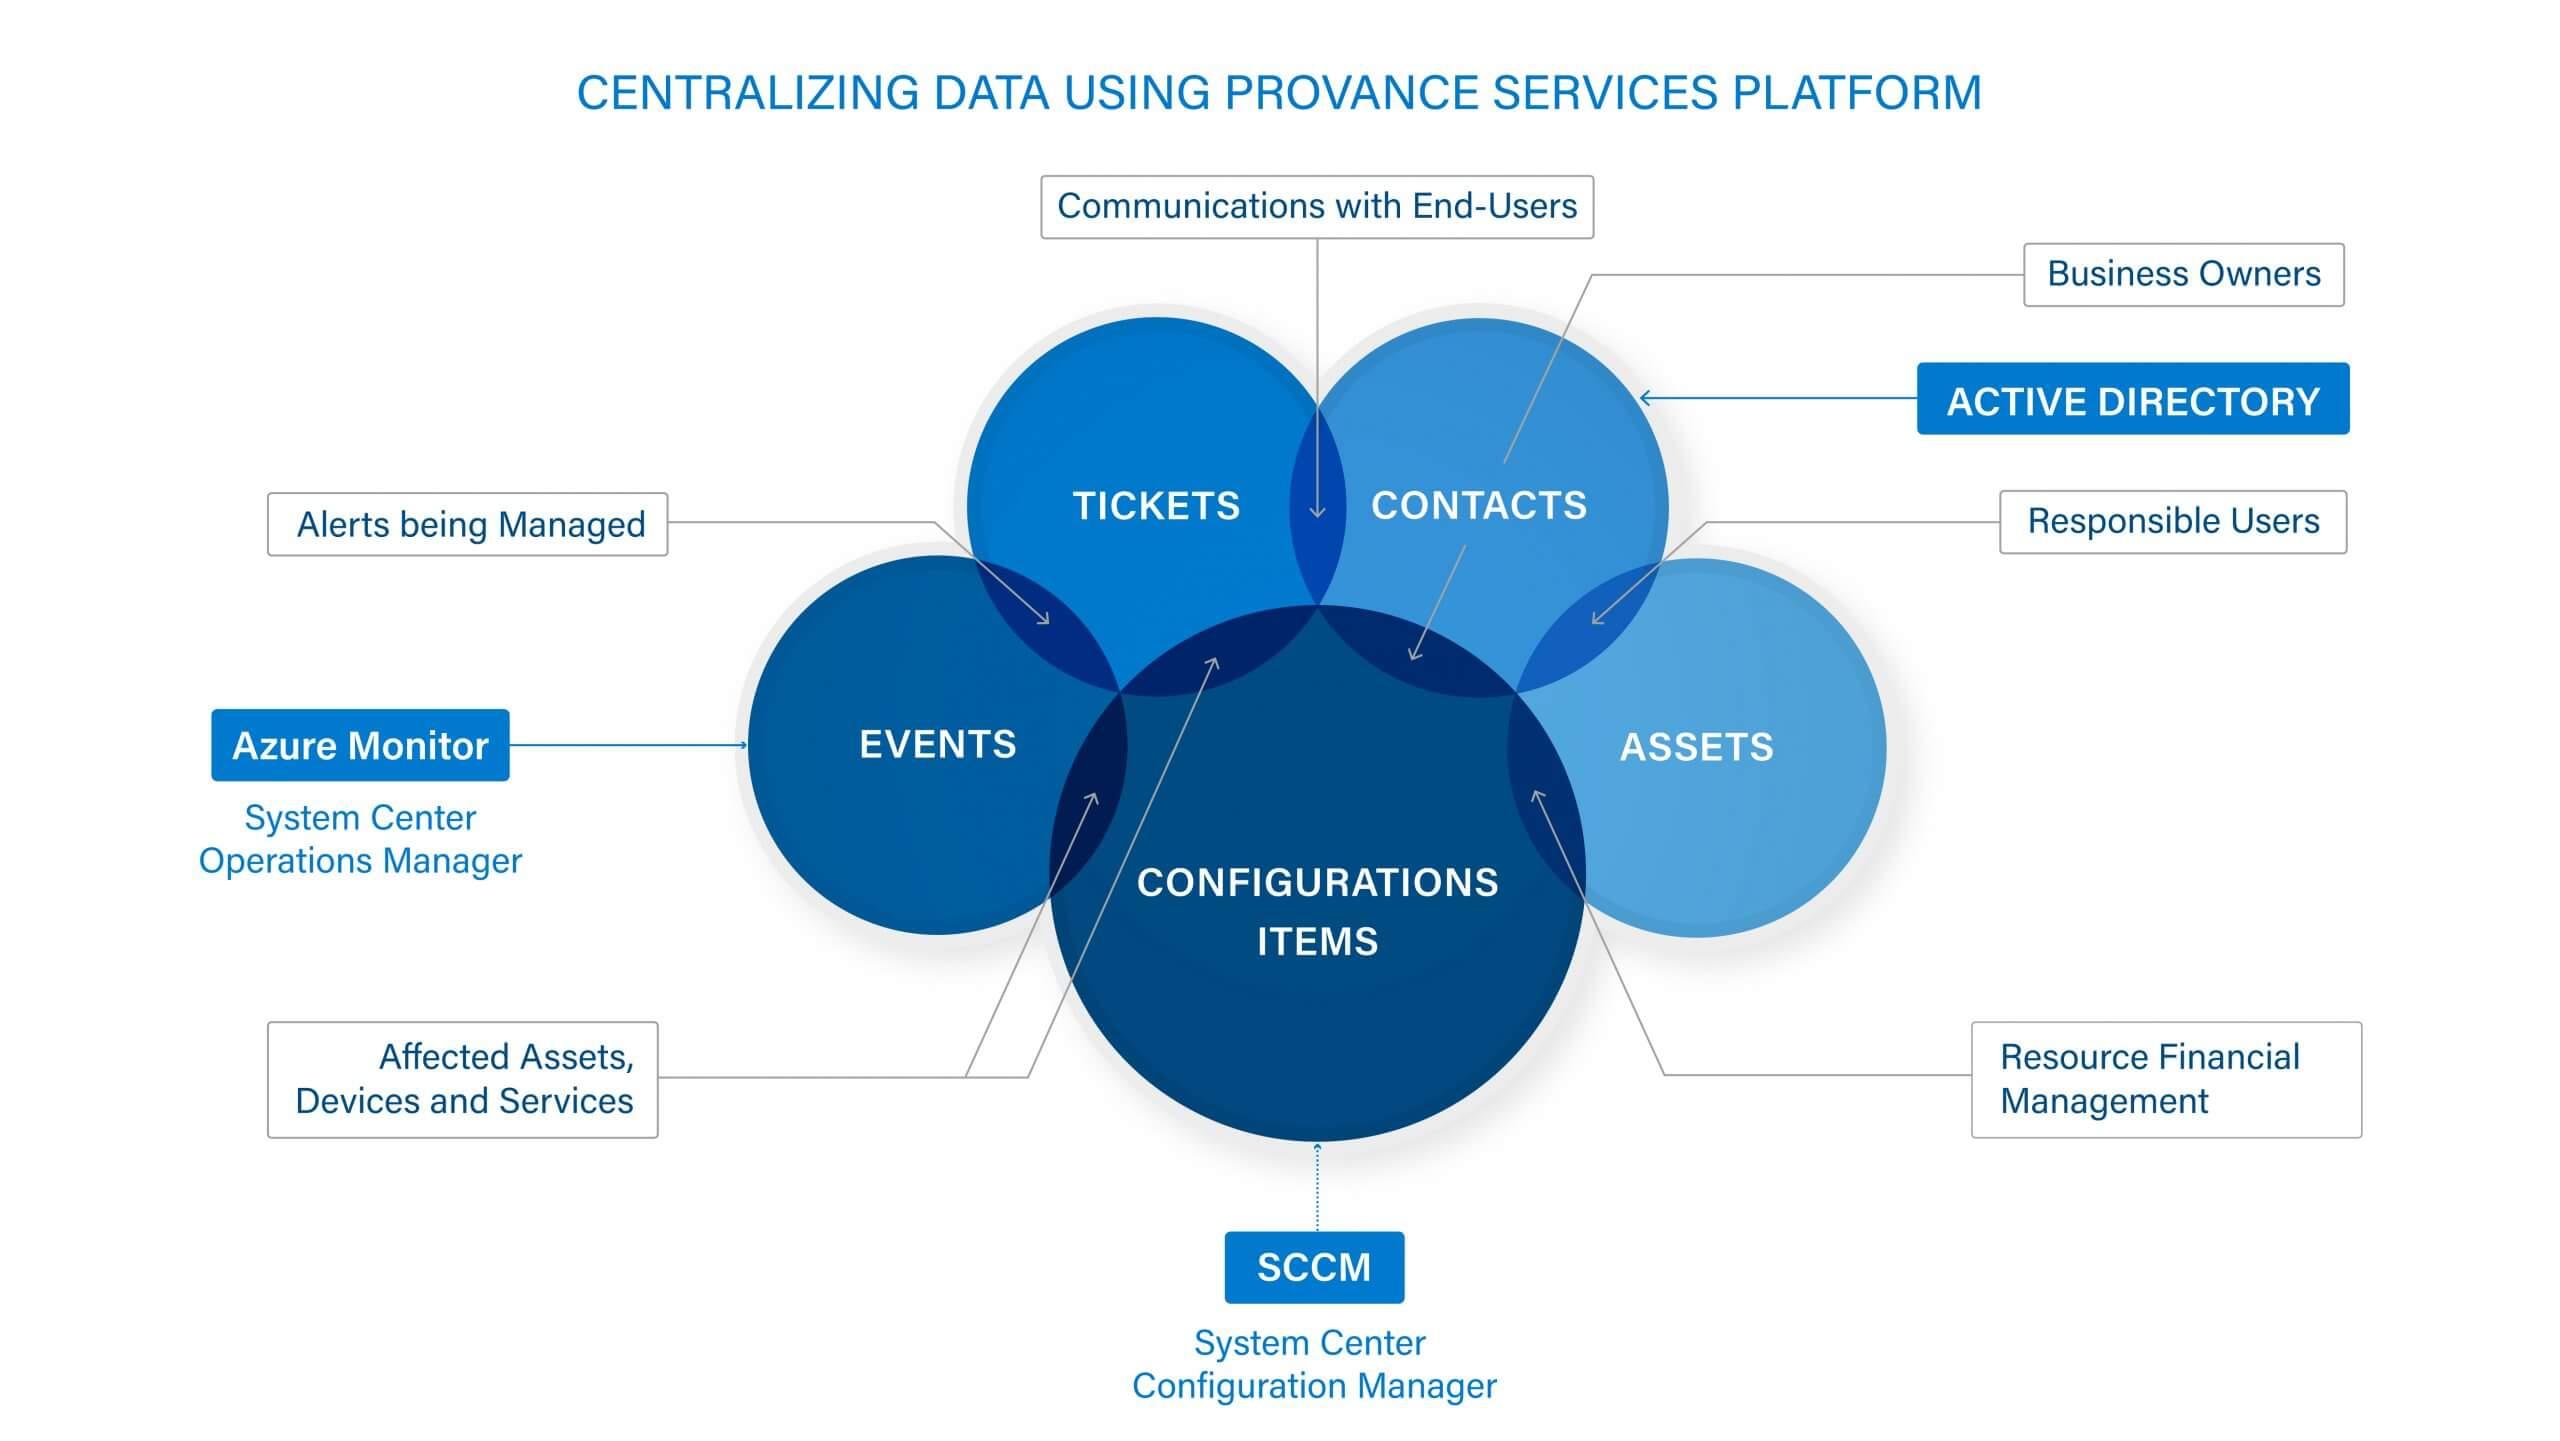 Centralizing data using Provance services platform Diagram